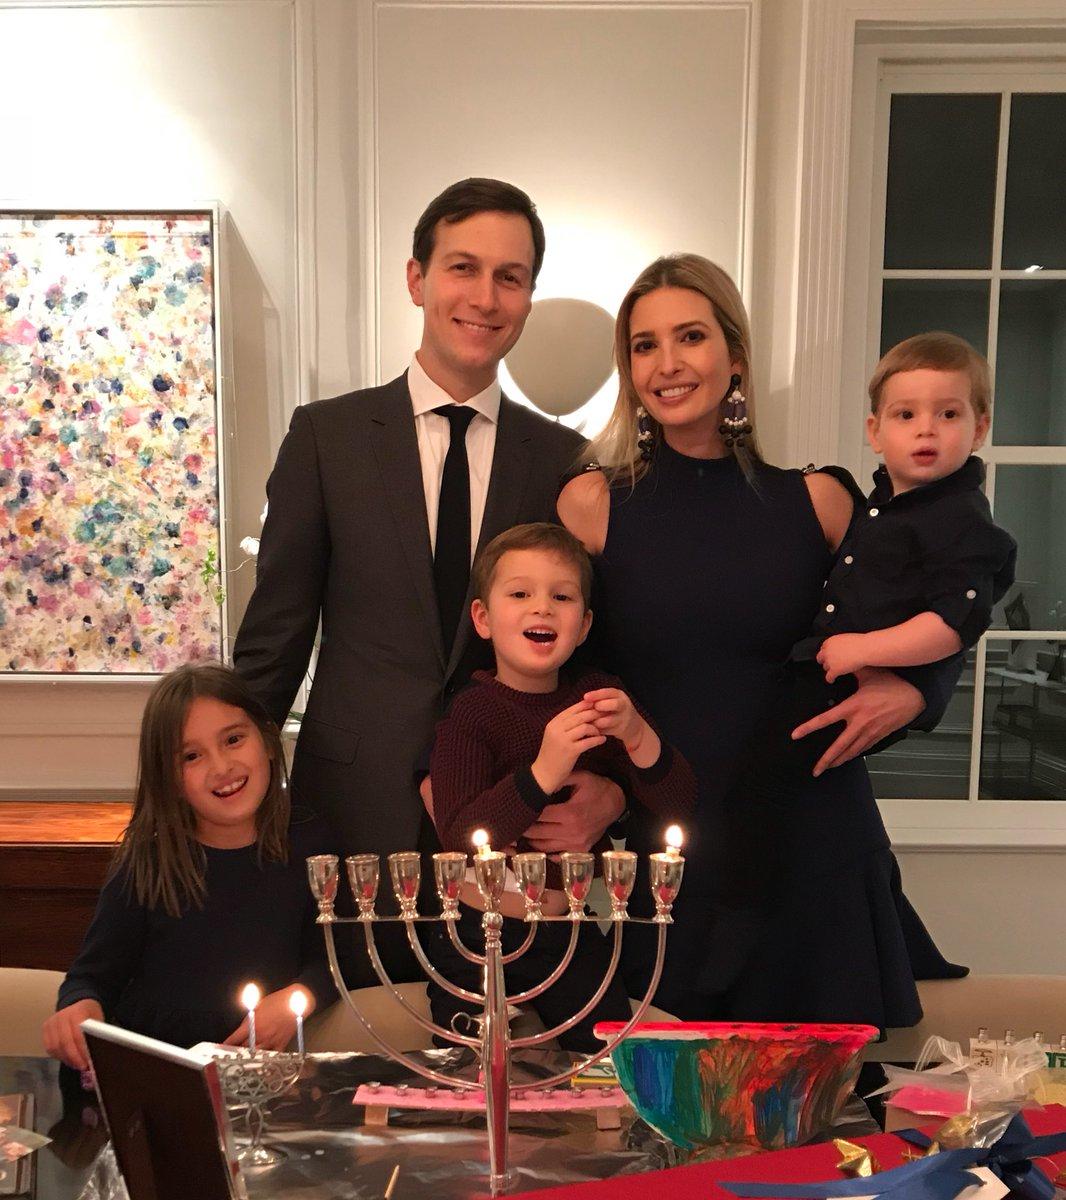 RT @IvankaTrump: Happy Chanukah!  #1stNight #HappyChanukah https://t.co/QF07wPA84B